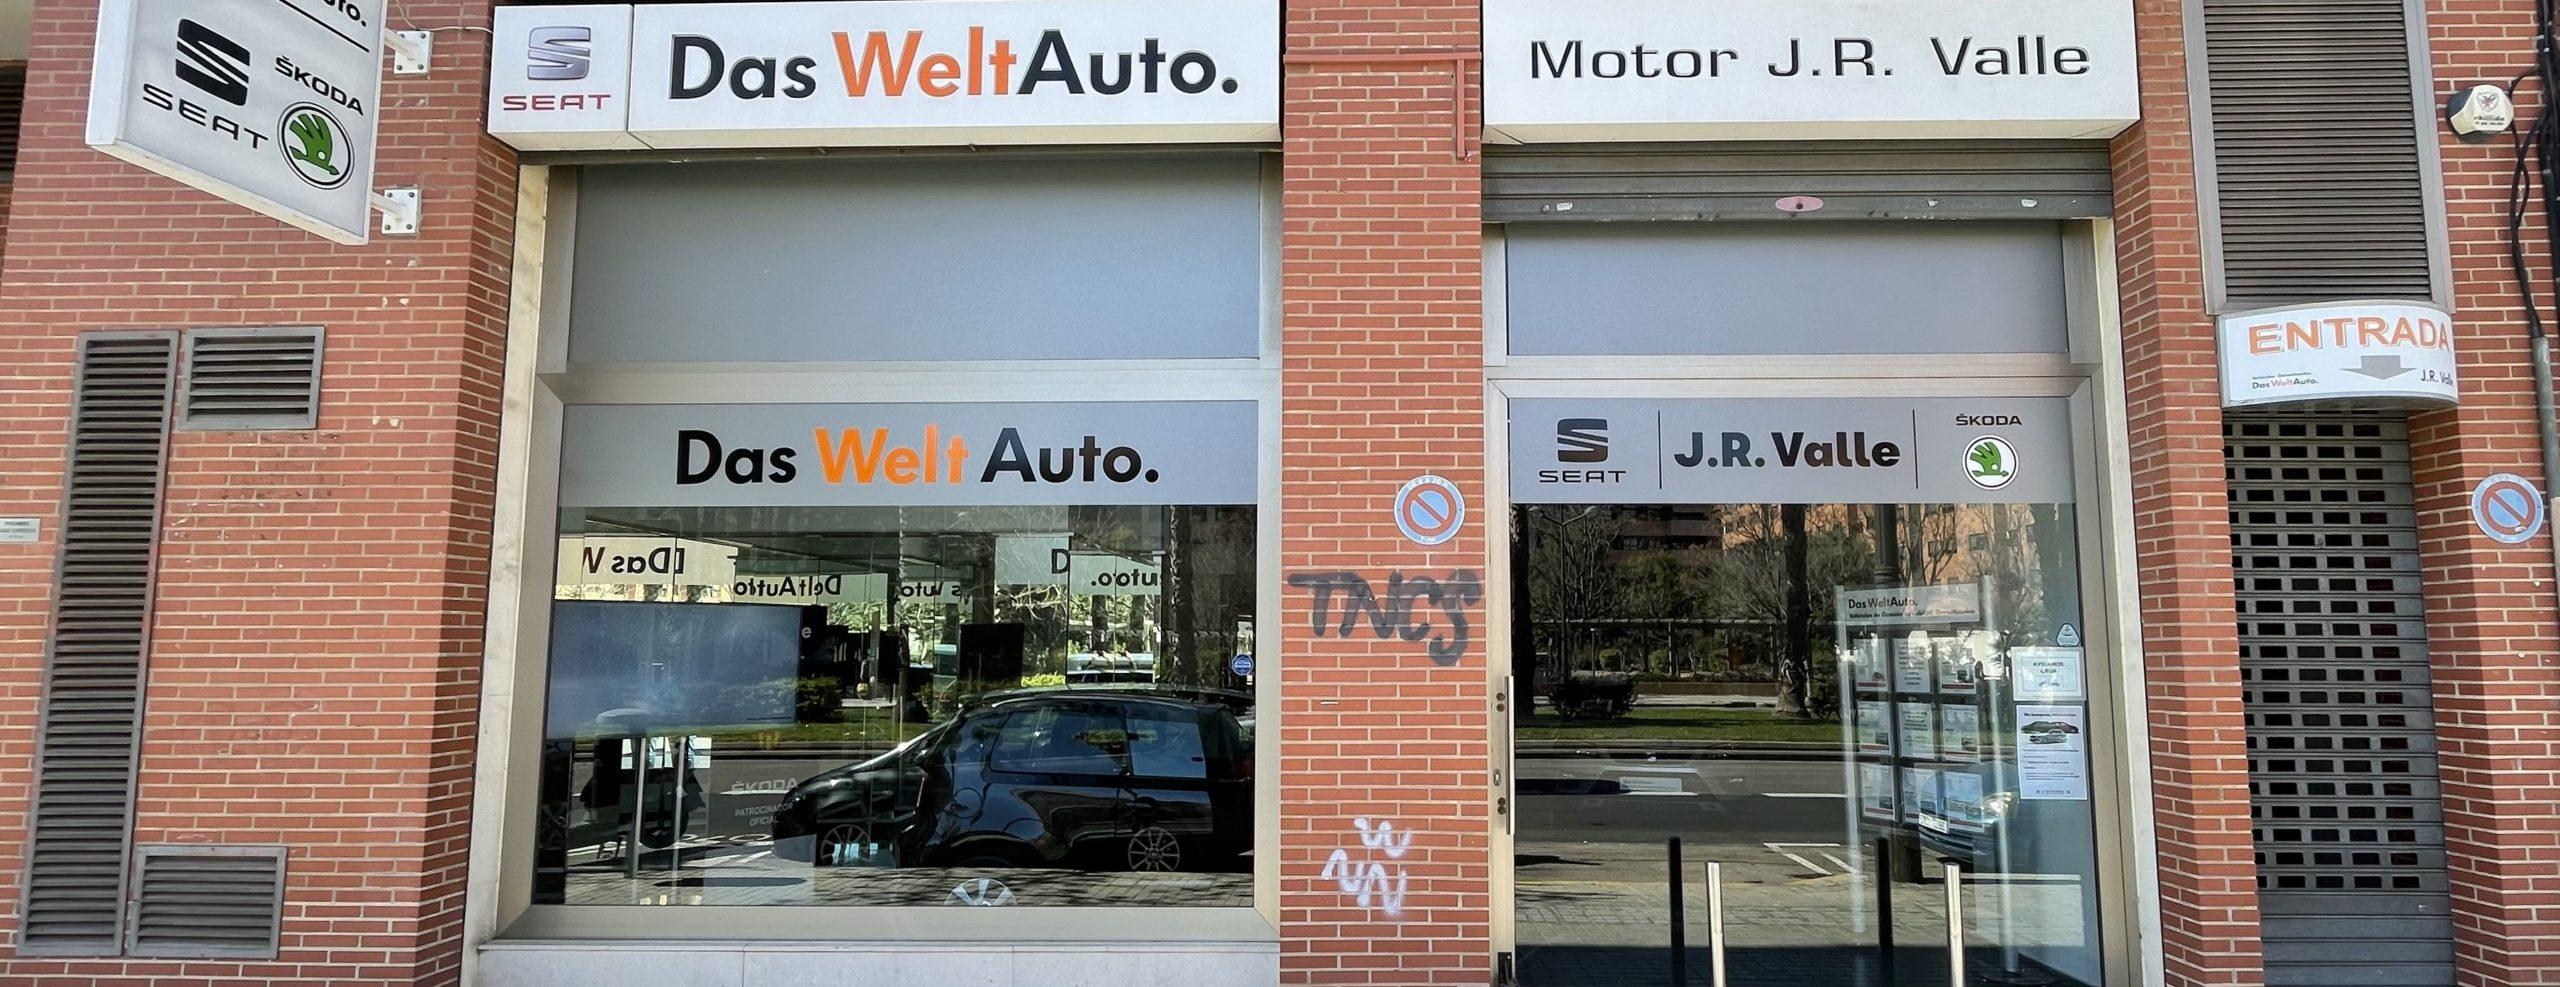 fechada-dasweltauto-jr-valle